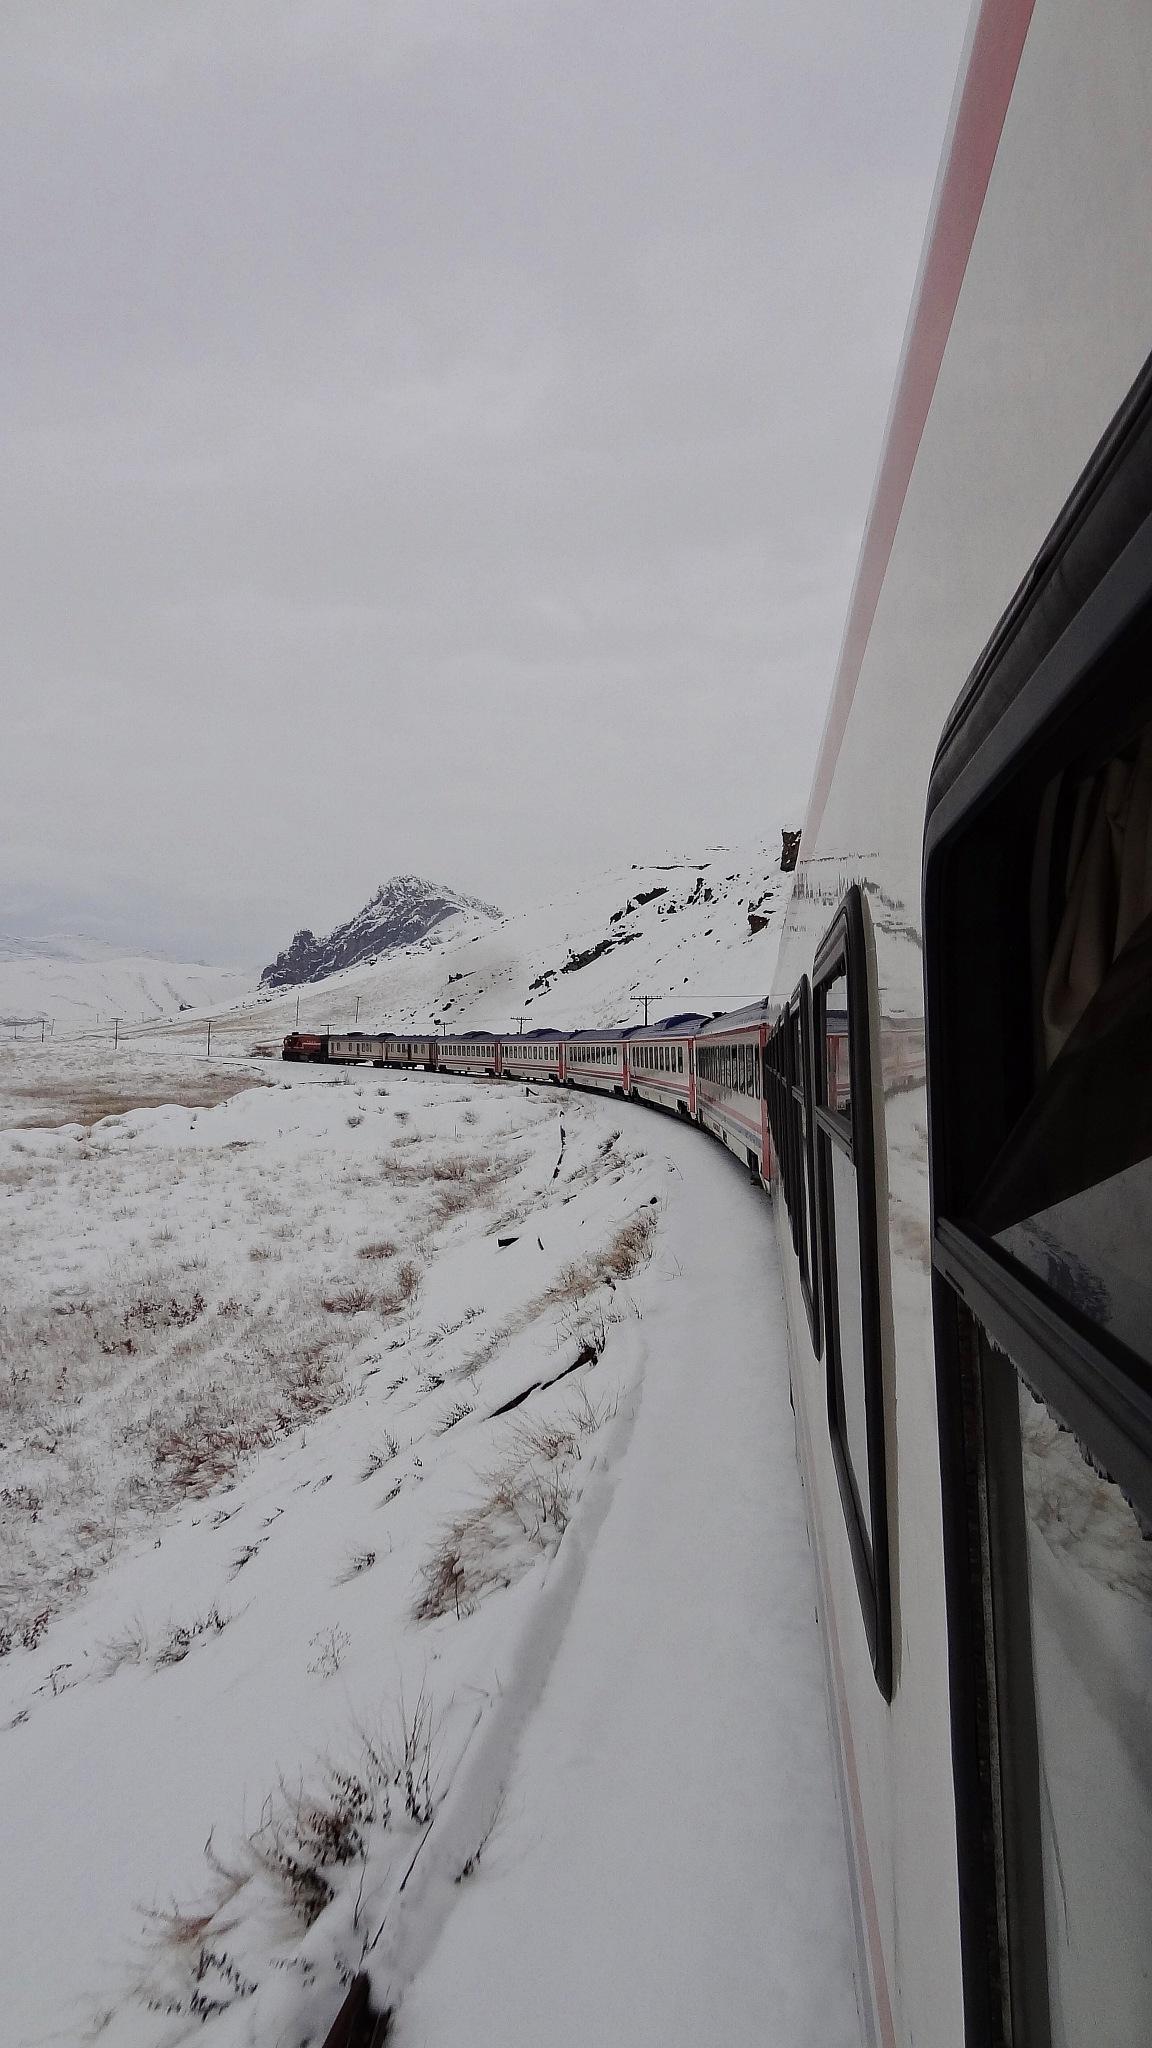 Train by Eren Cevik